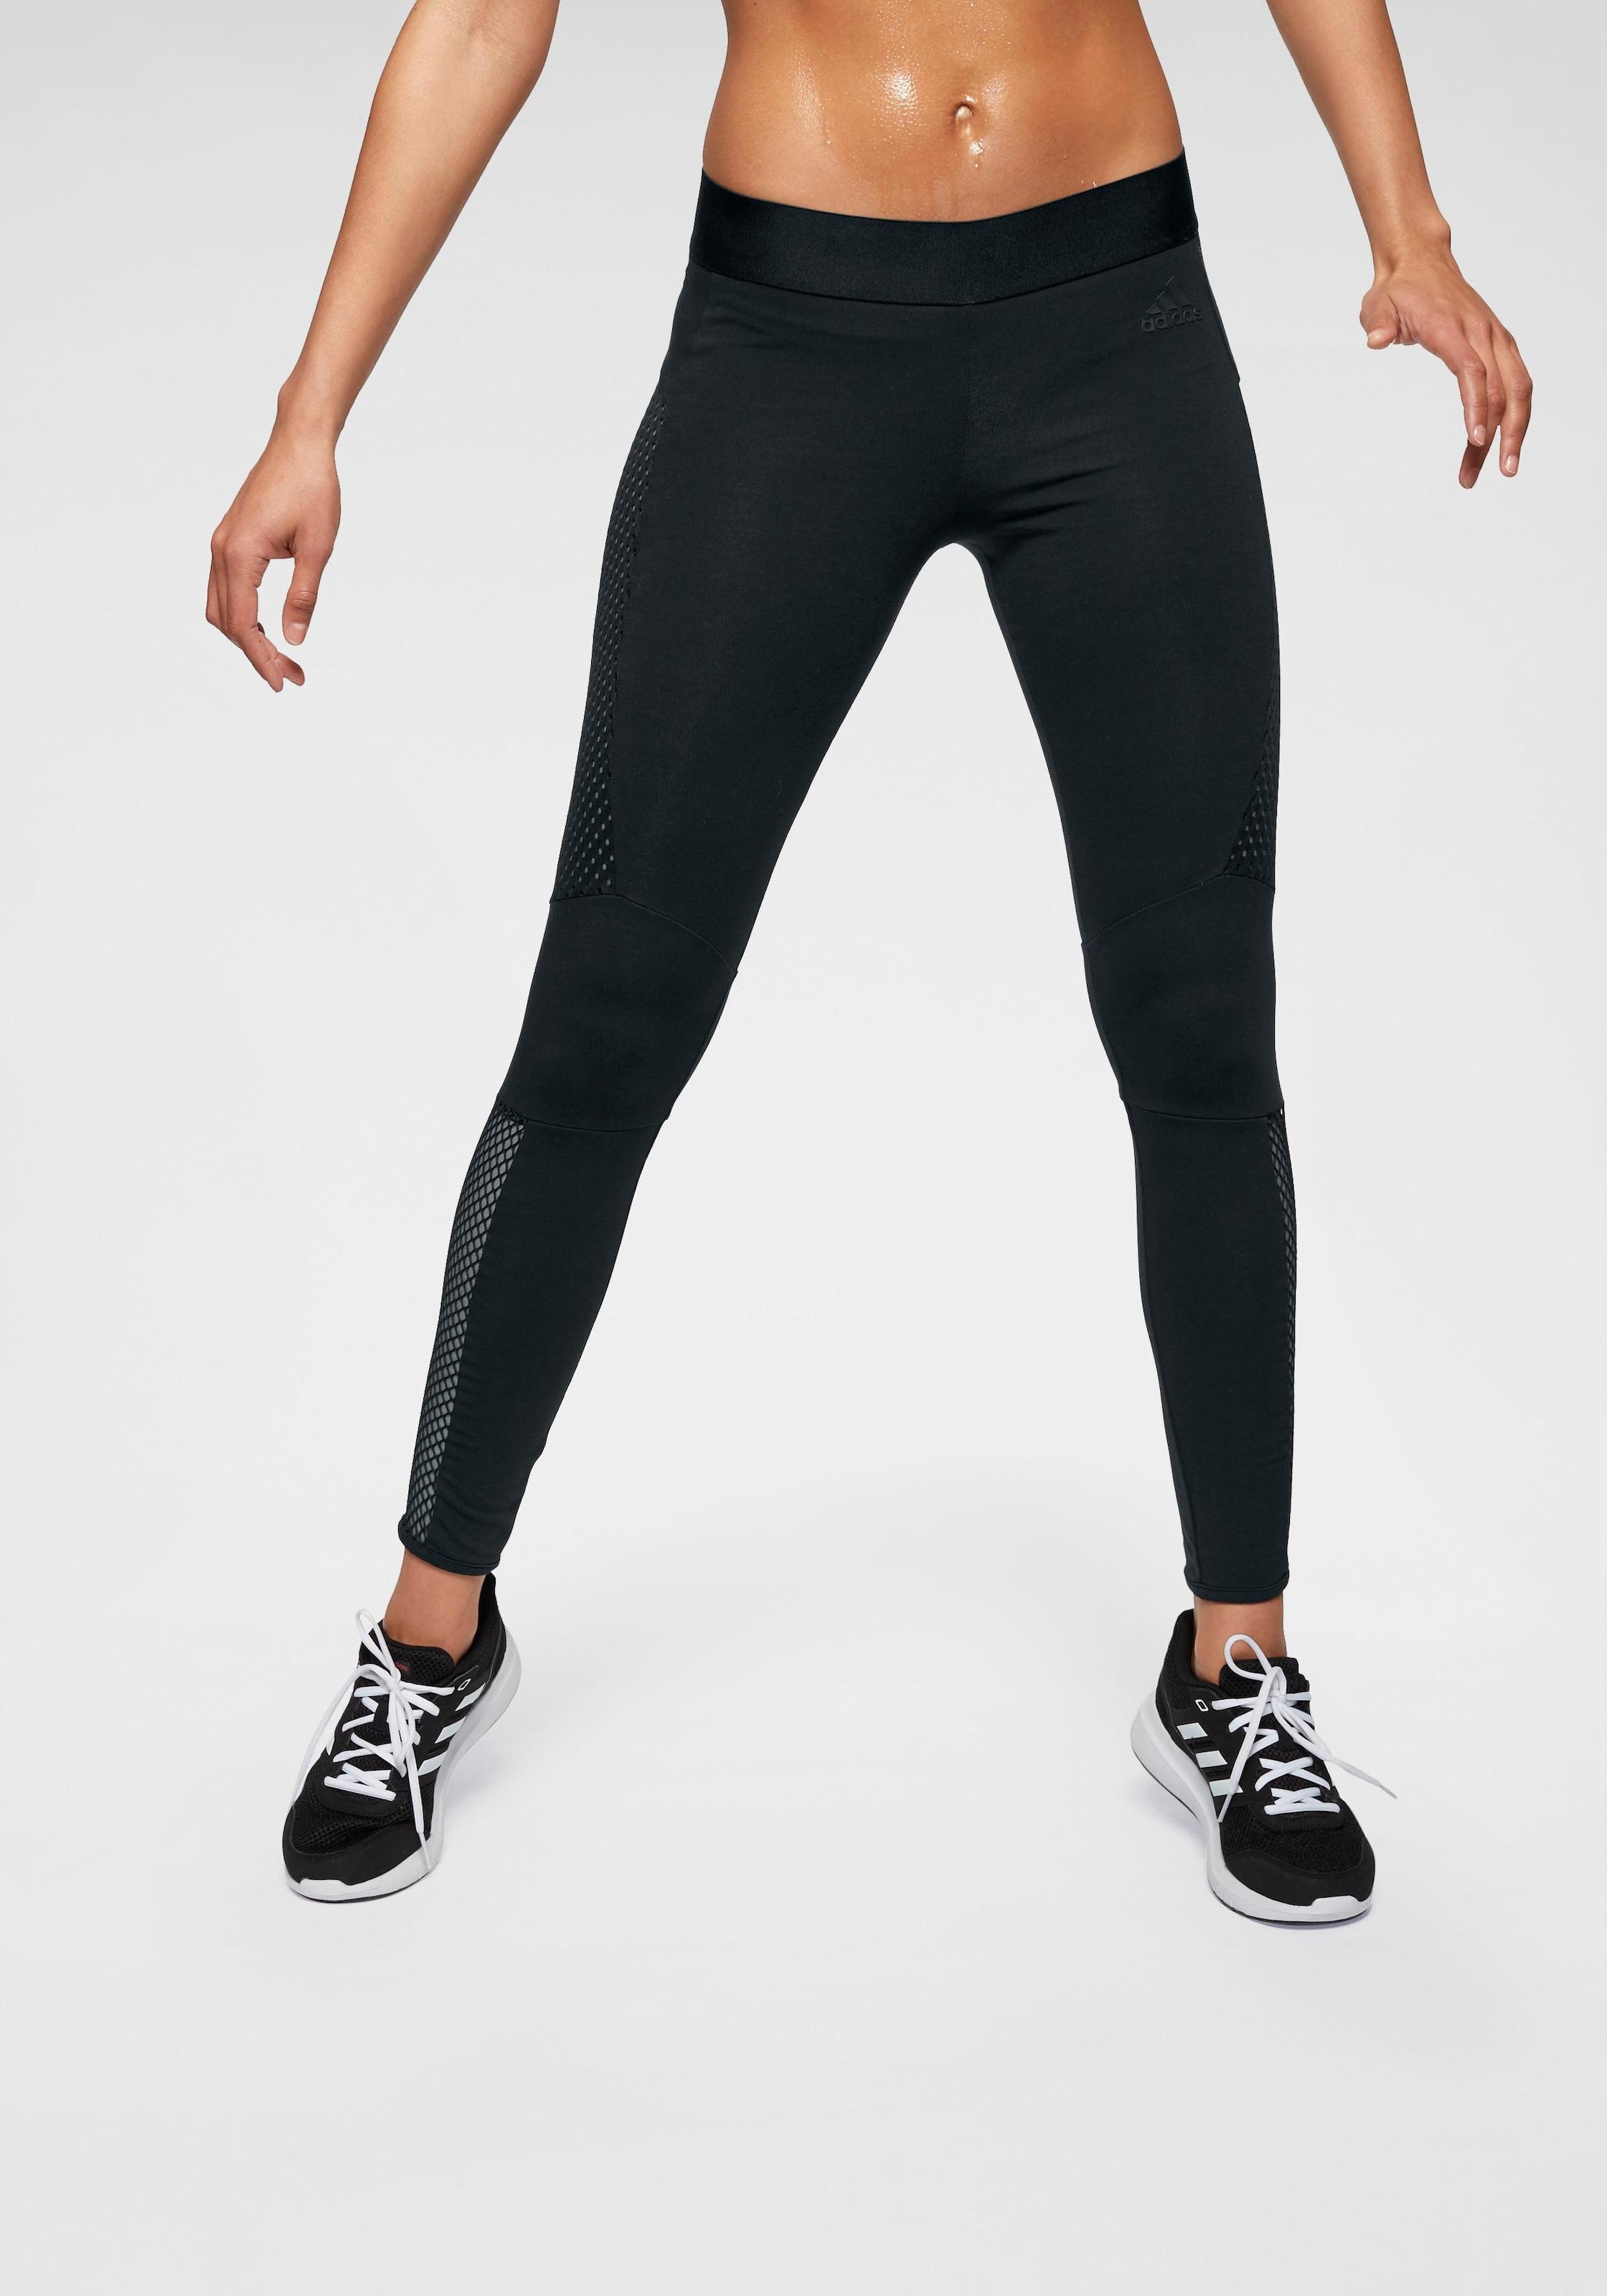 adidas performance leggings